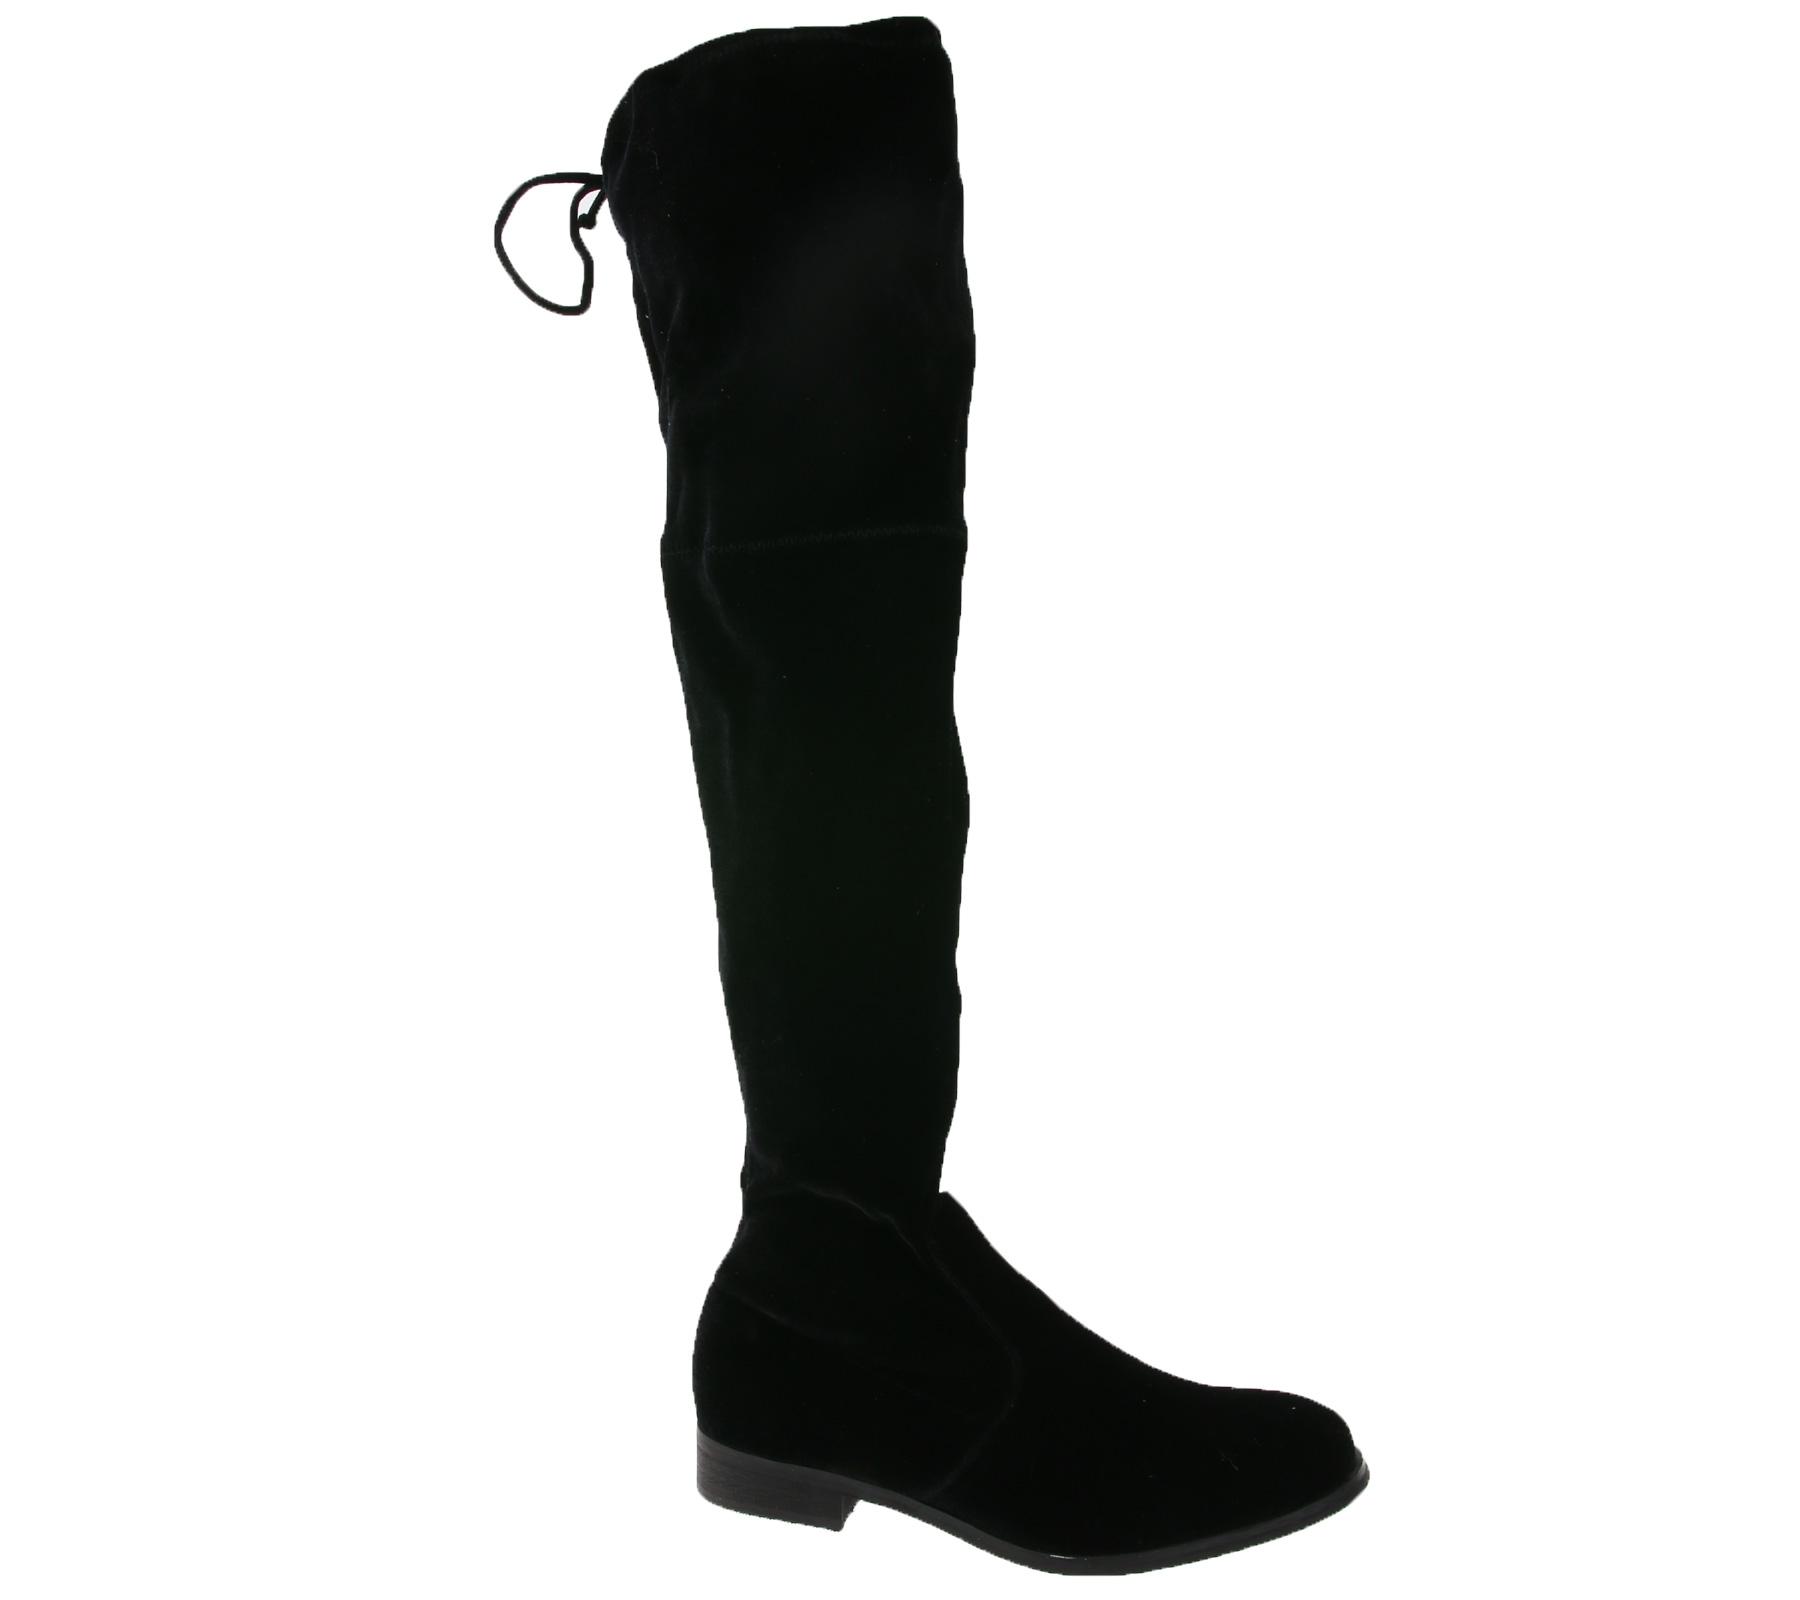 geschickte Herstellung gut aus x am besten auswählen POELMAN Velvet Boots Stylish Women's Over The Knee Boots Adriana lll Black  | Outlet46.com